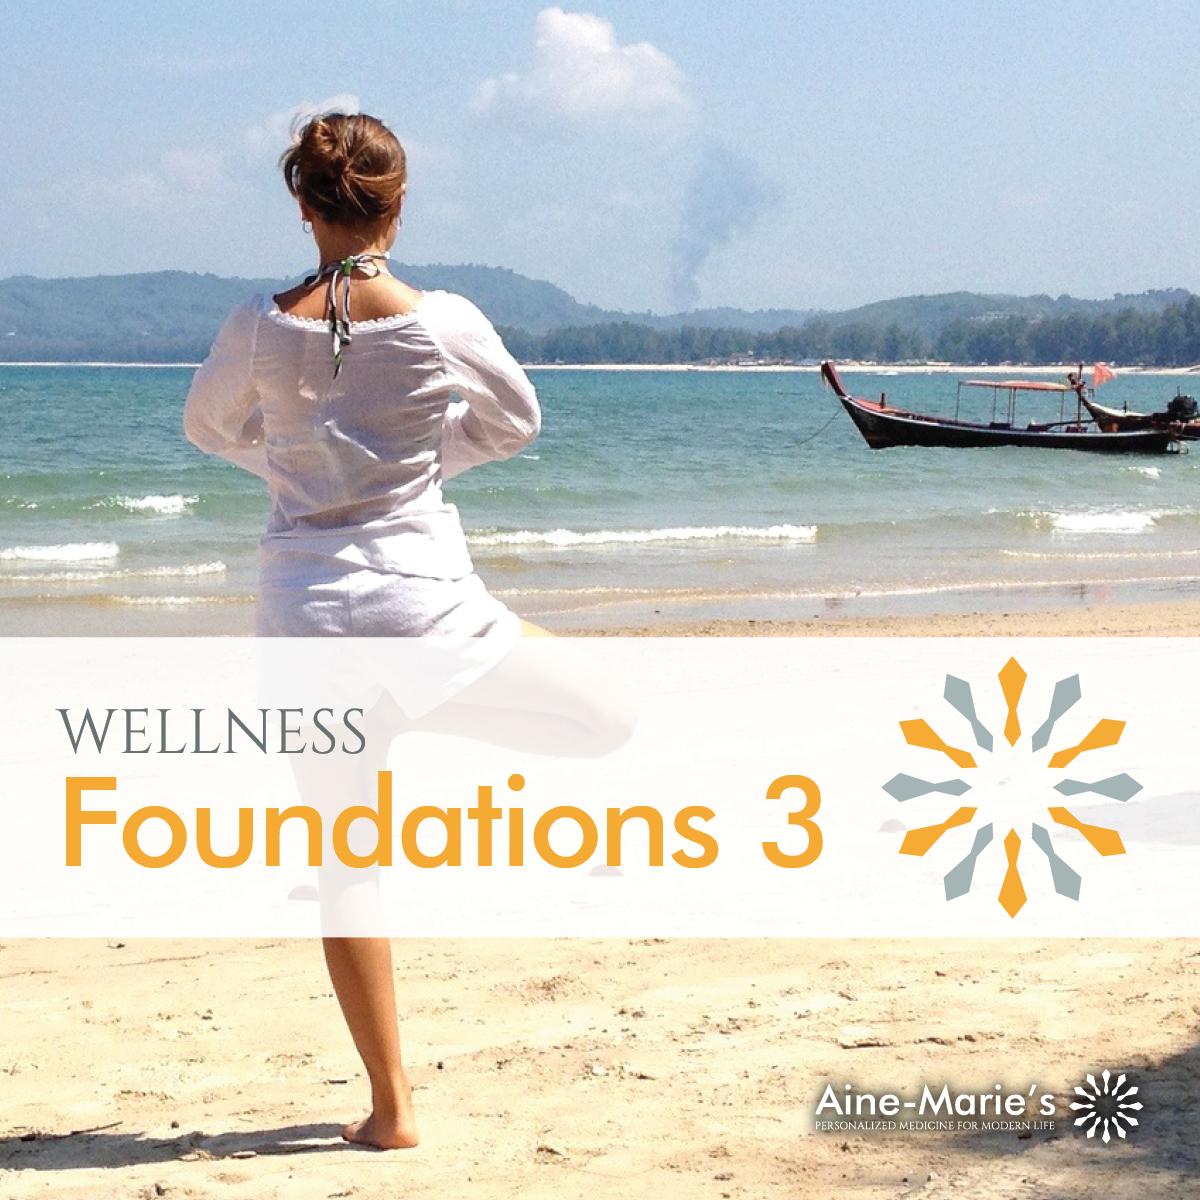 Wellness Foundations 3